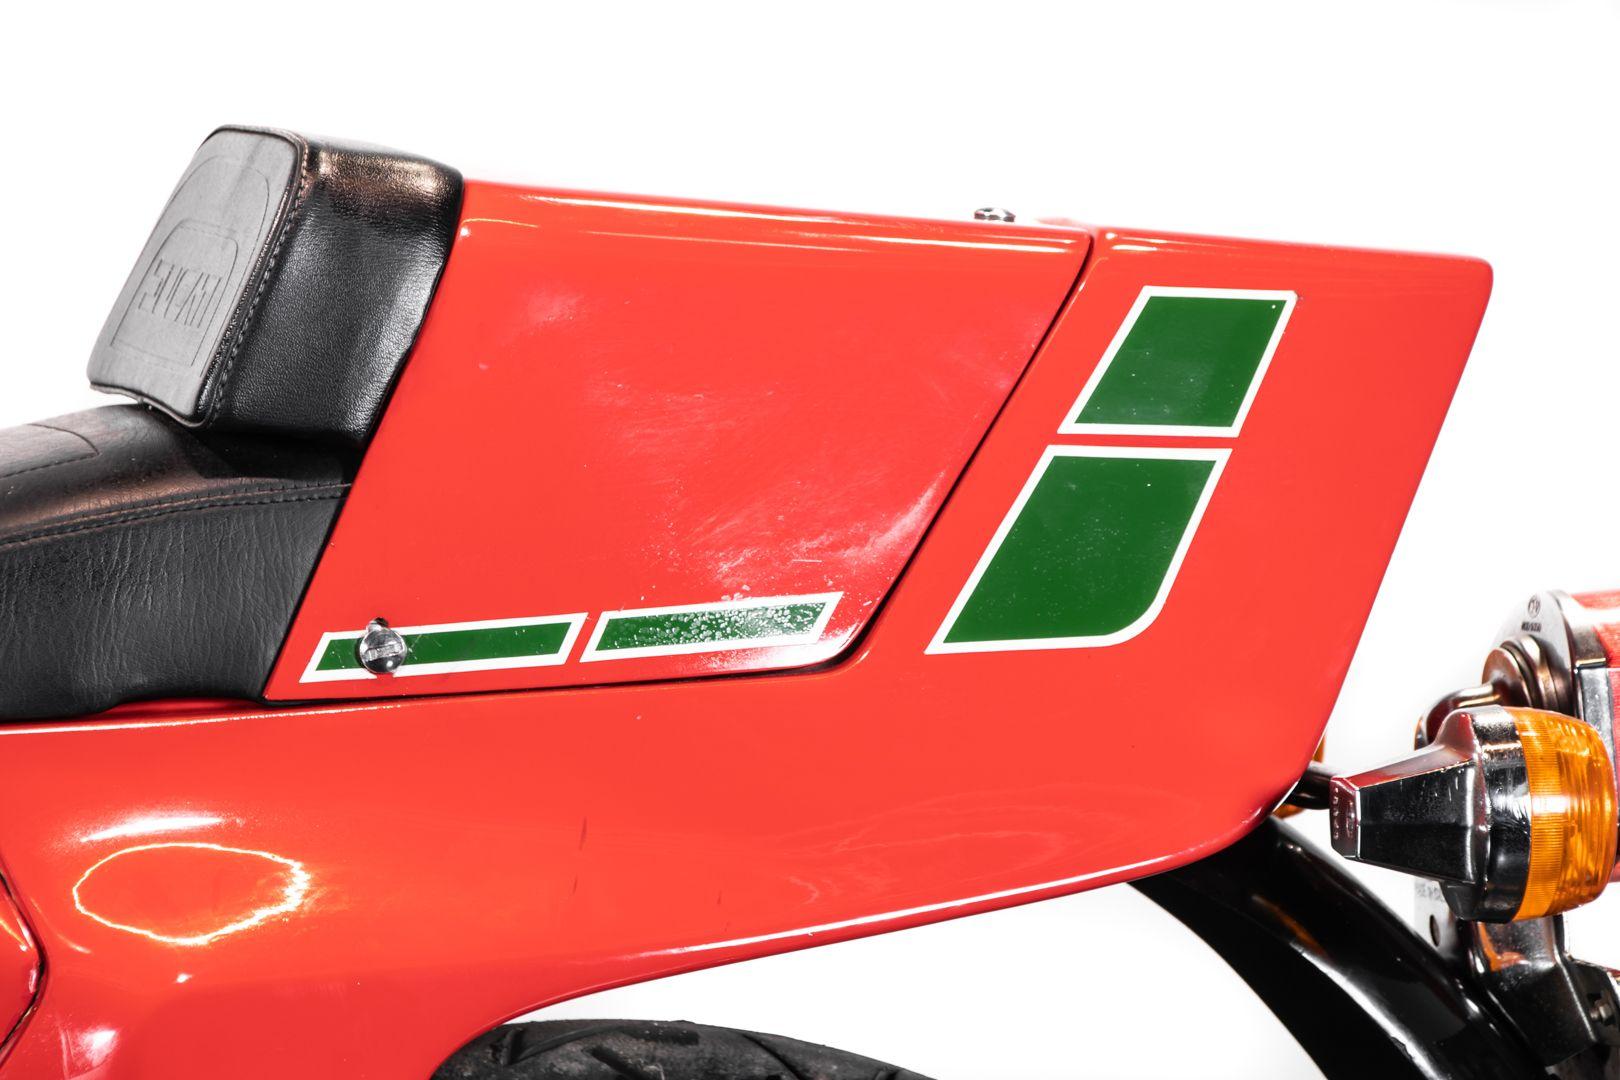 1983 Ducati 900 Mike Hailwood Replica 71416